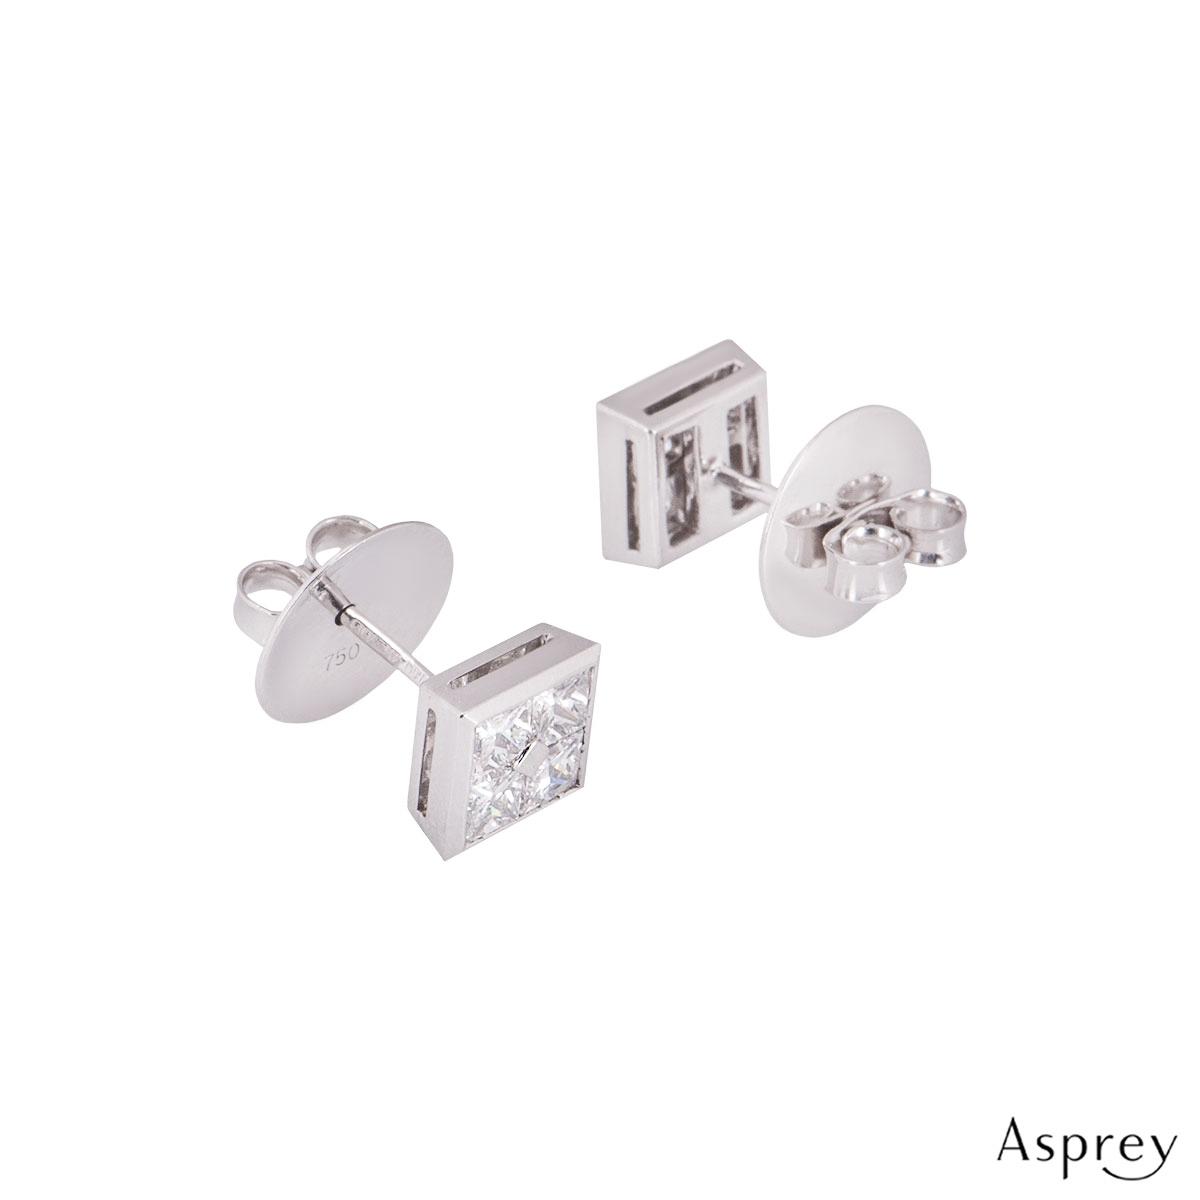 Asprey Platinum Square Diamond Earrings